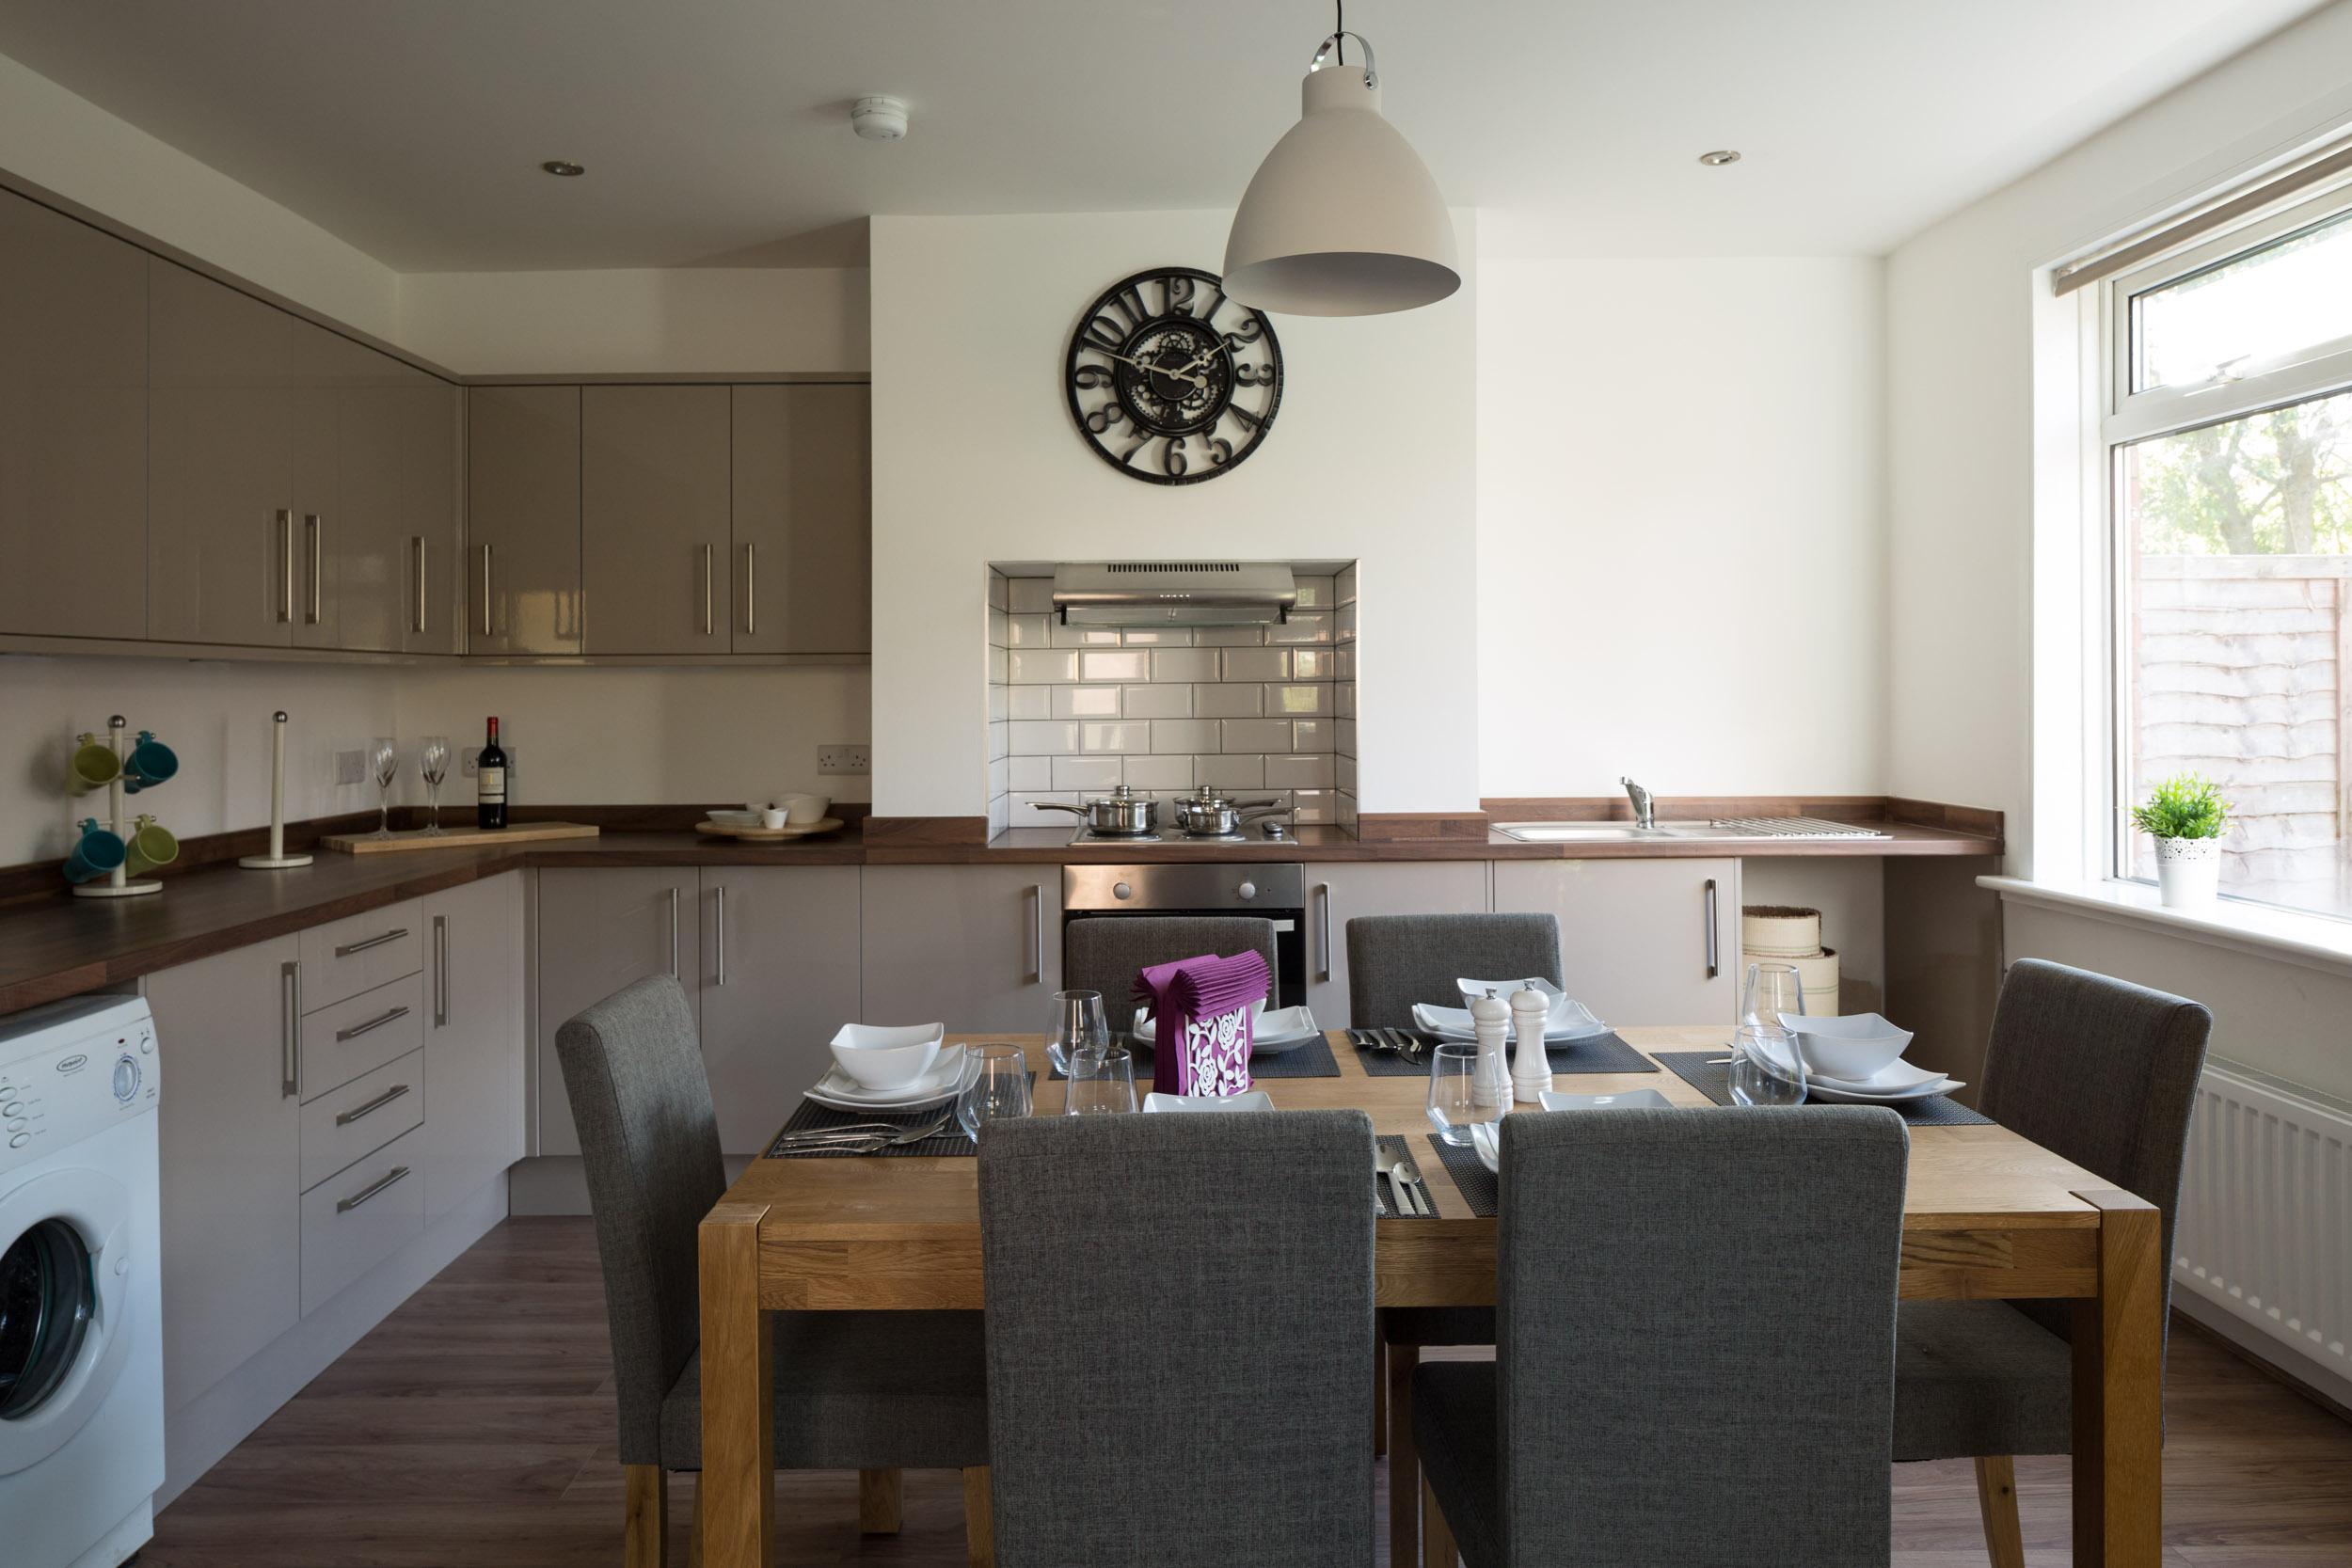 leeds restidential property kitchen interior before.jpg